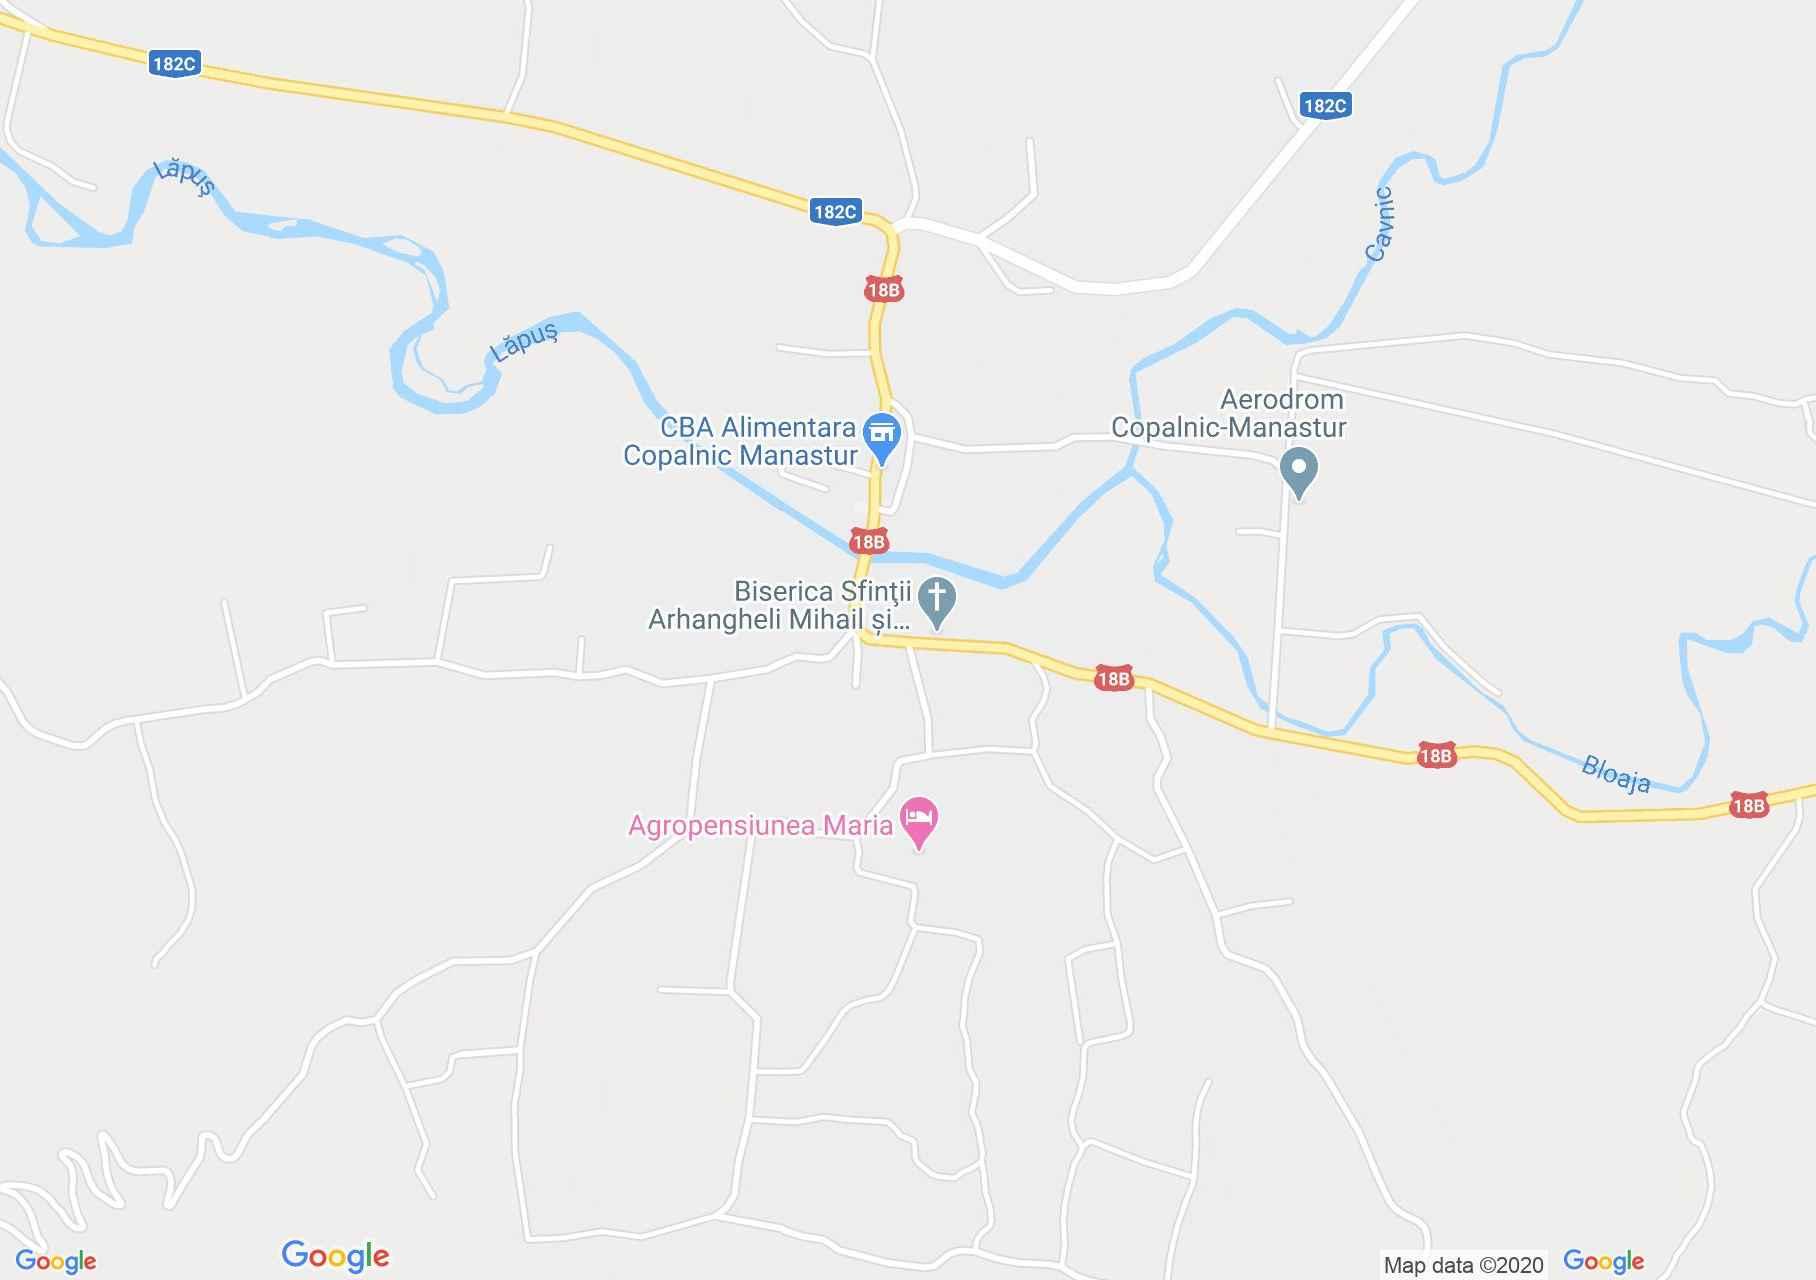 Copalnic-Mănăştur, Interactive tourist map